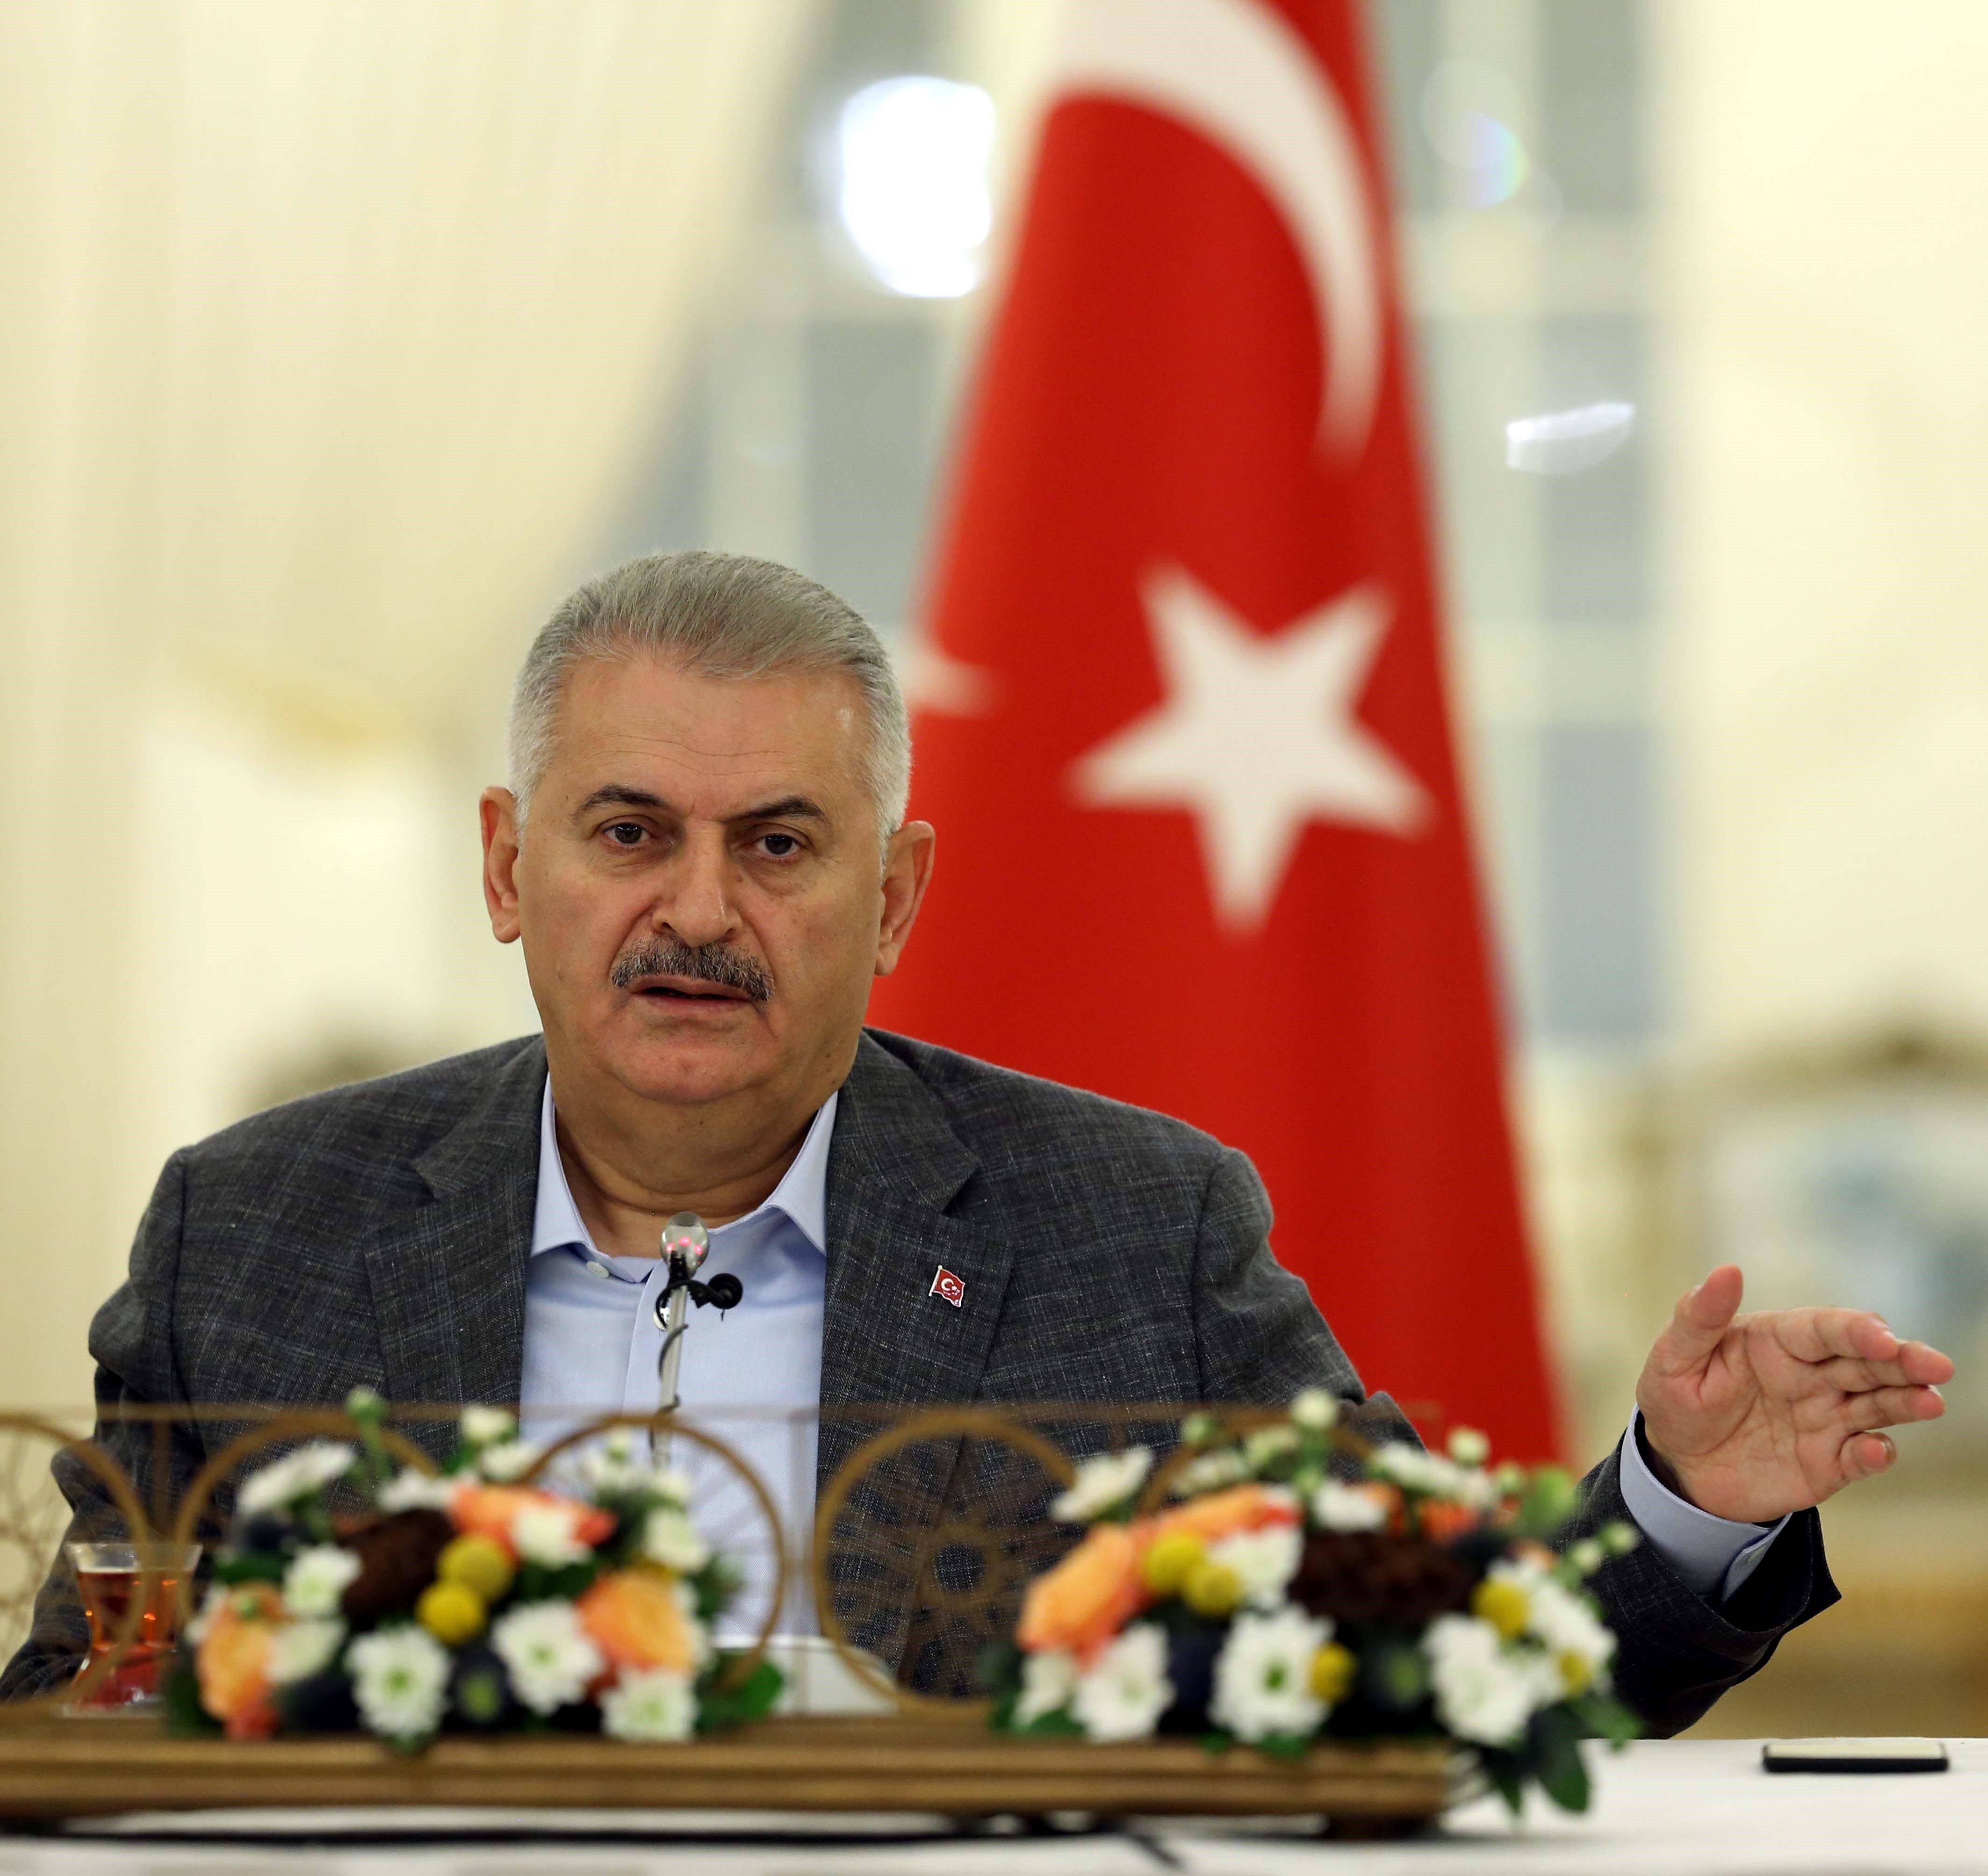 ANKARA, TURKEY - AUGUST 13: Turkish Prime Minister Binali Yildirim speaks to press members at Cankaya Palace in Ankara, Turkey on August 13, 2016.  (Photo by Utku Ucrak/Anadolu Agency/Getty Images)